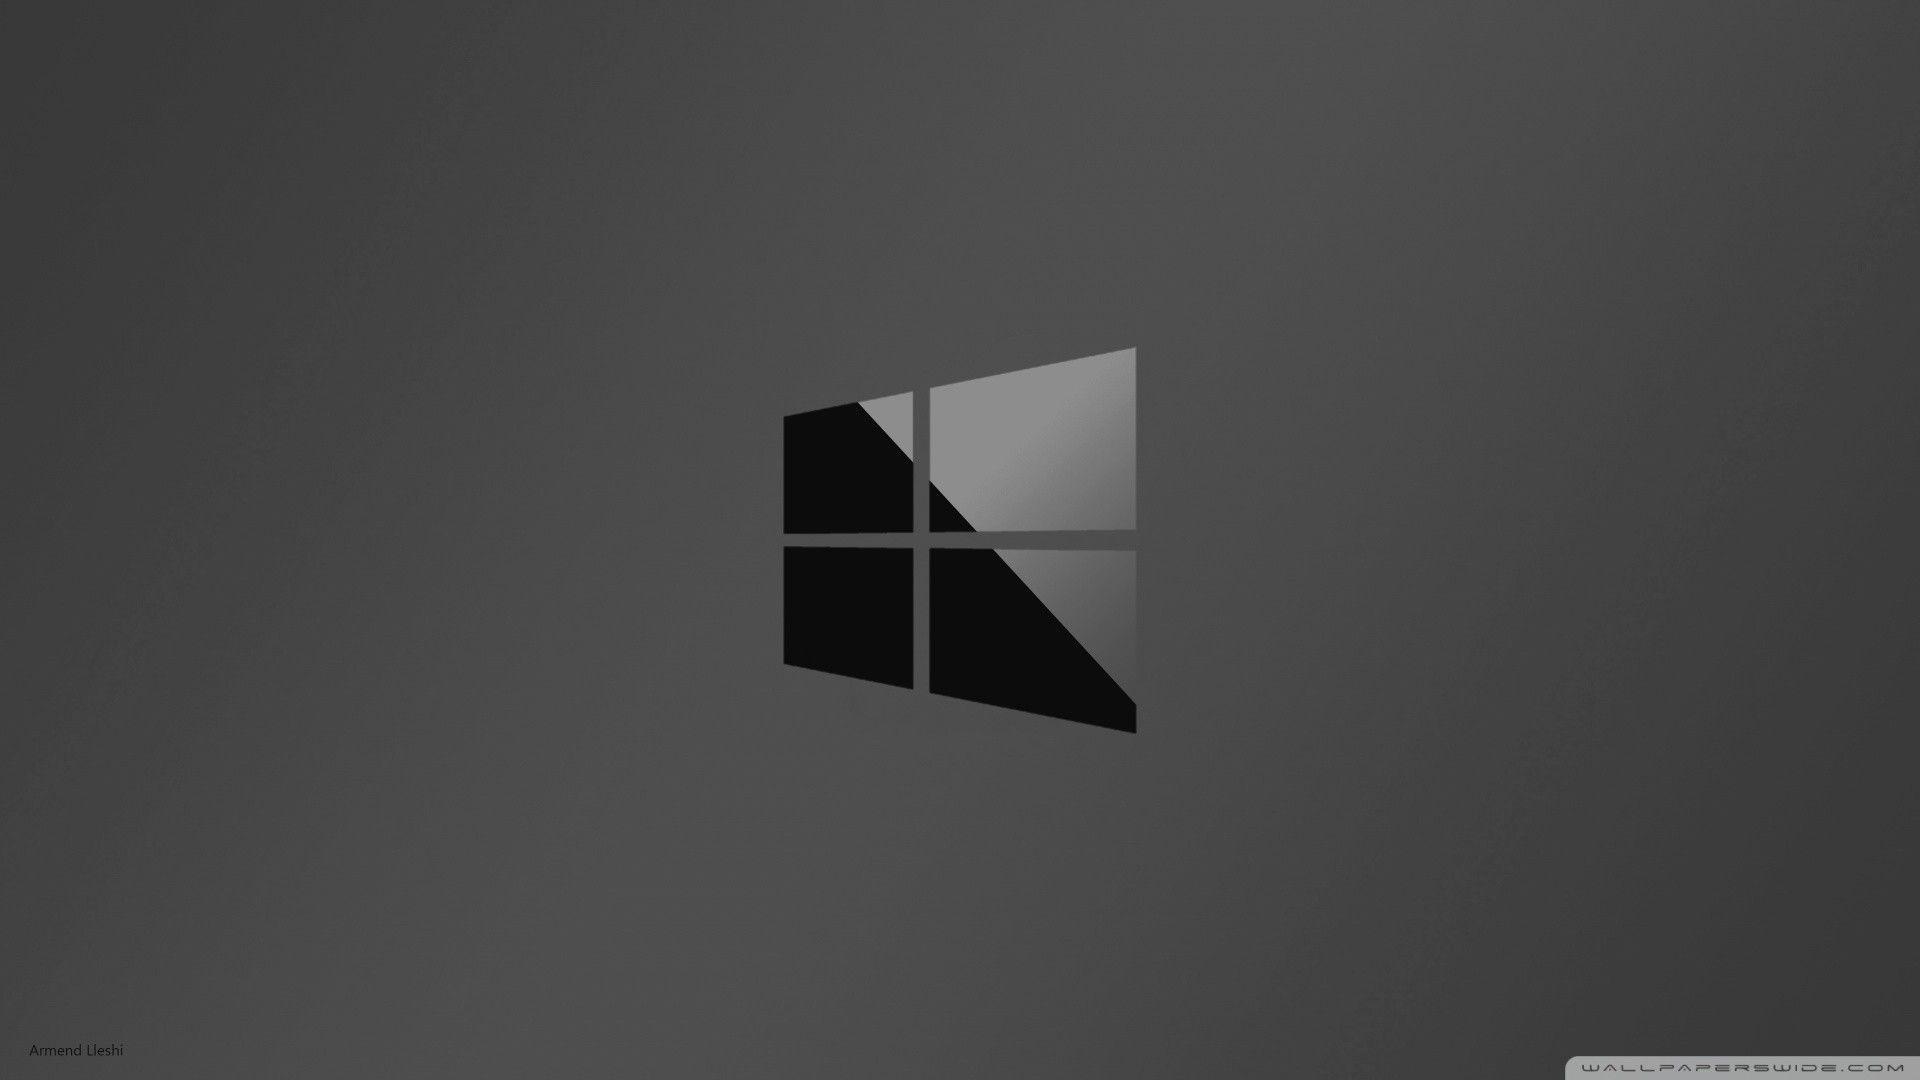 1920x1080 Hd 16 9 Wallpaper Windows 10 Desktop Wallpaper Black Windows Wallpaper